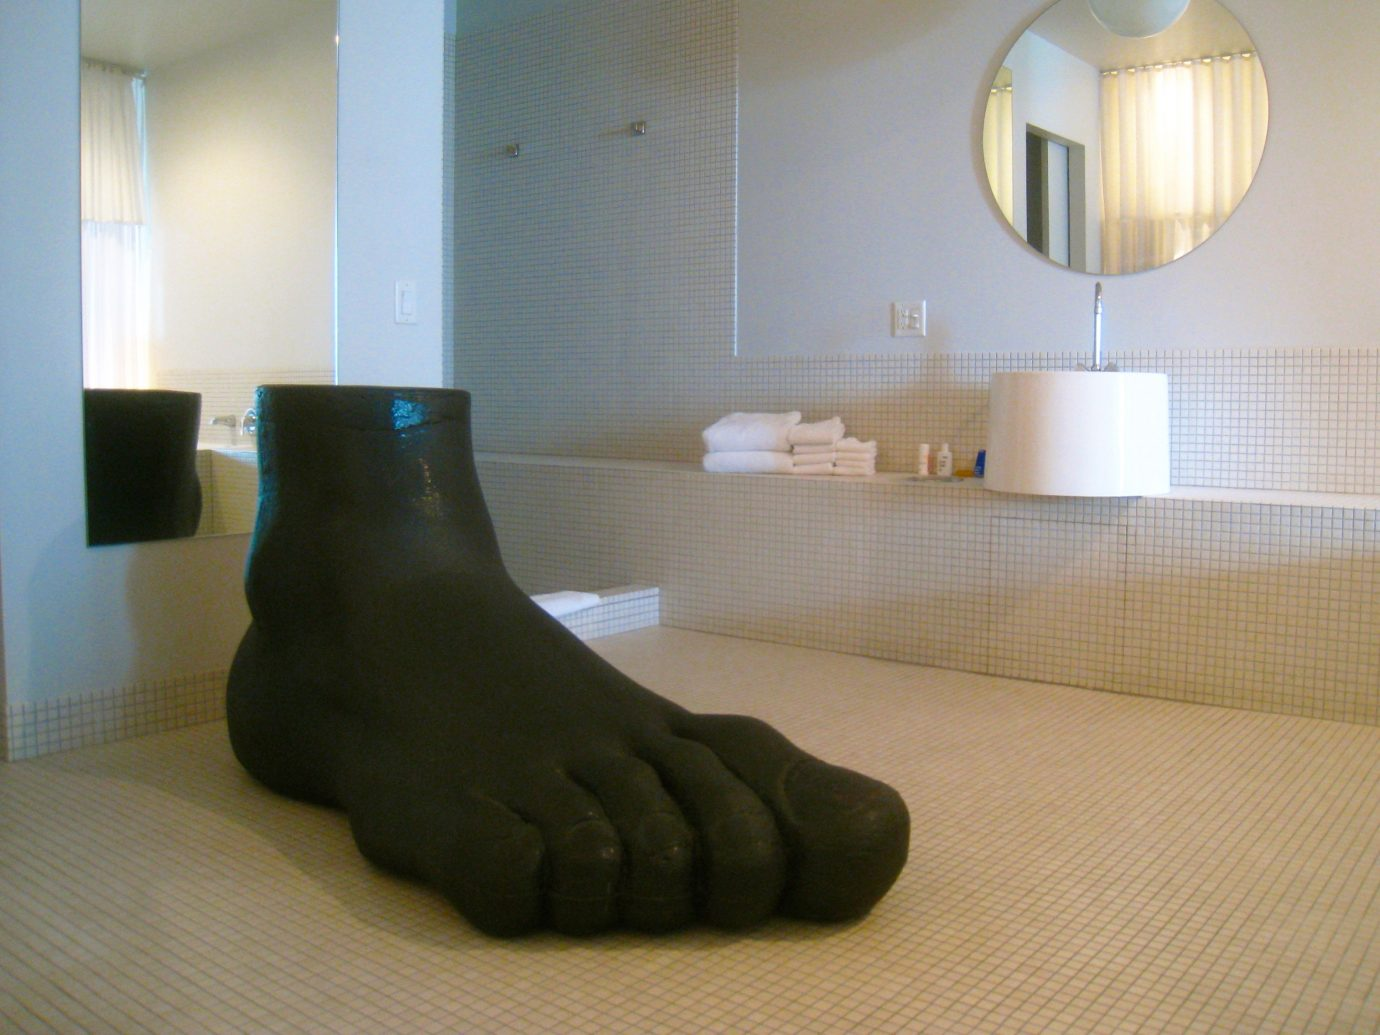 Hotels Offbeat indoor wall floor room flooring interior design living room lighting wood furniture Design leg